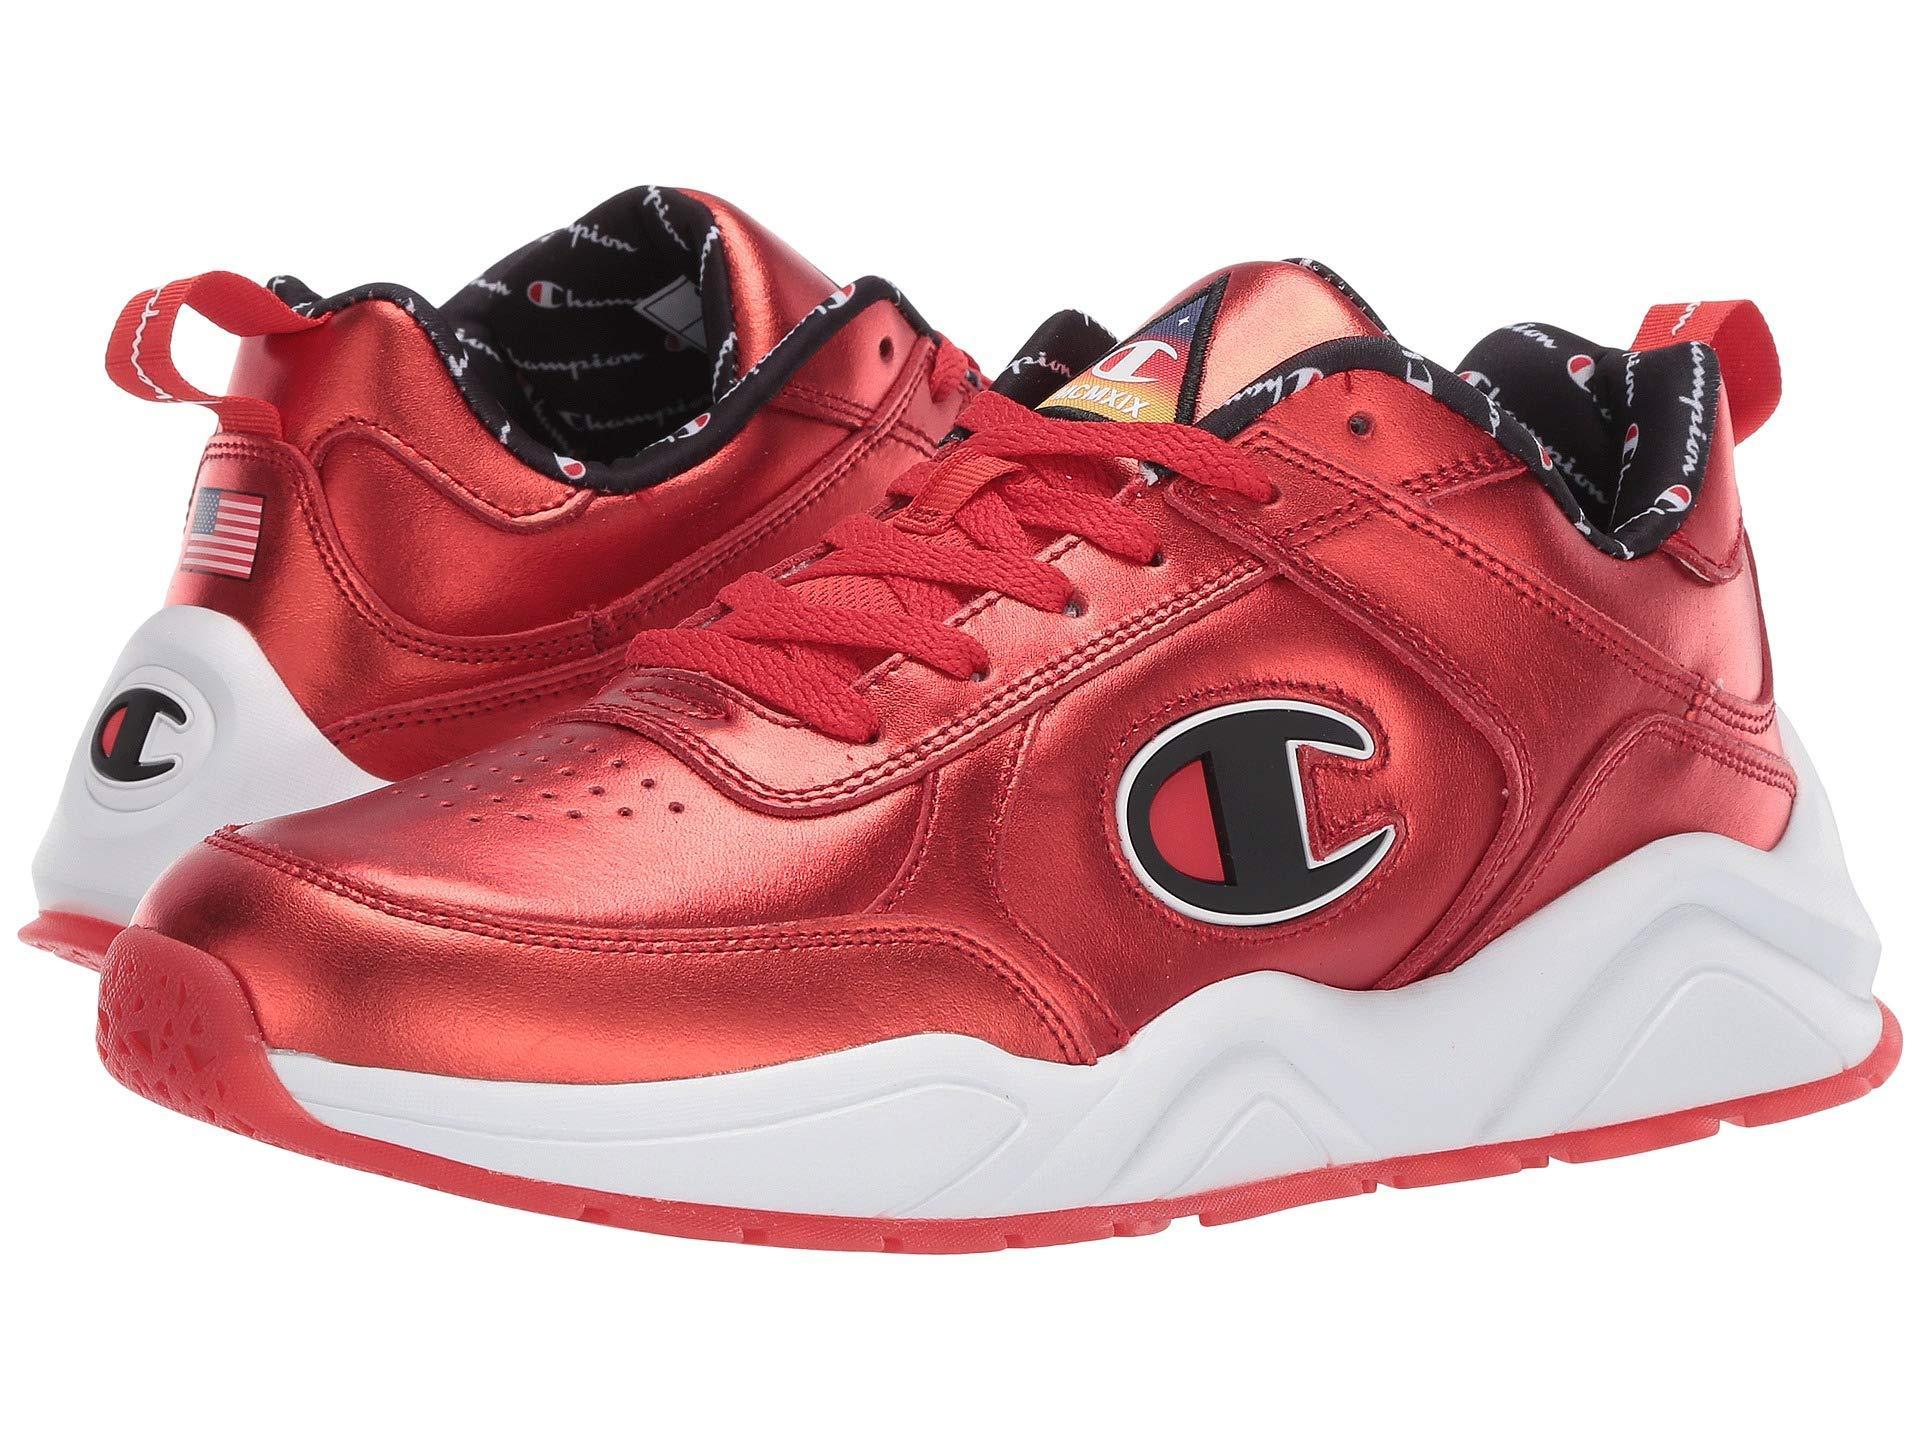 87da380f8 Lyst - Champion 93 Eighteen (maroon) Men s Shoes in Red for Men